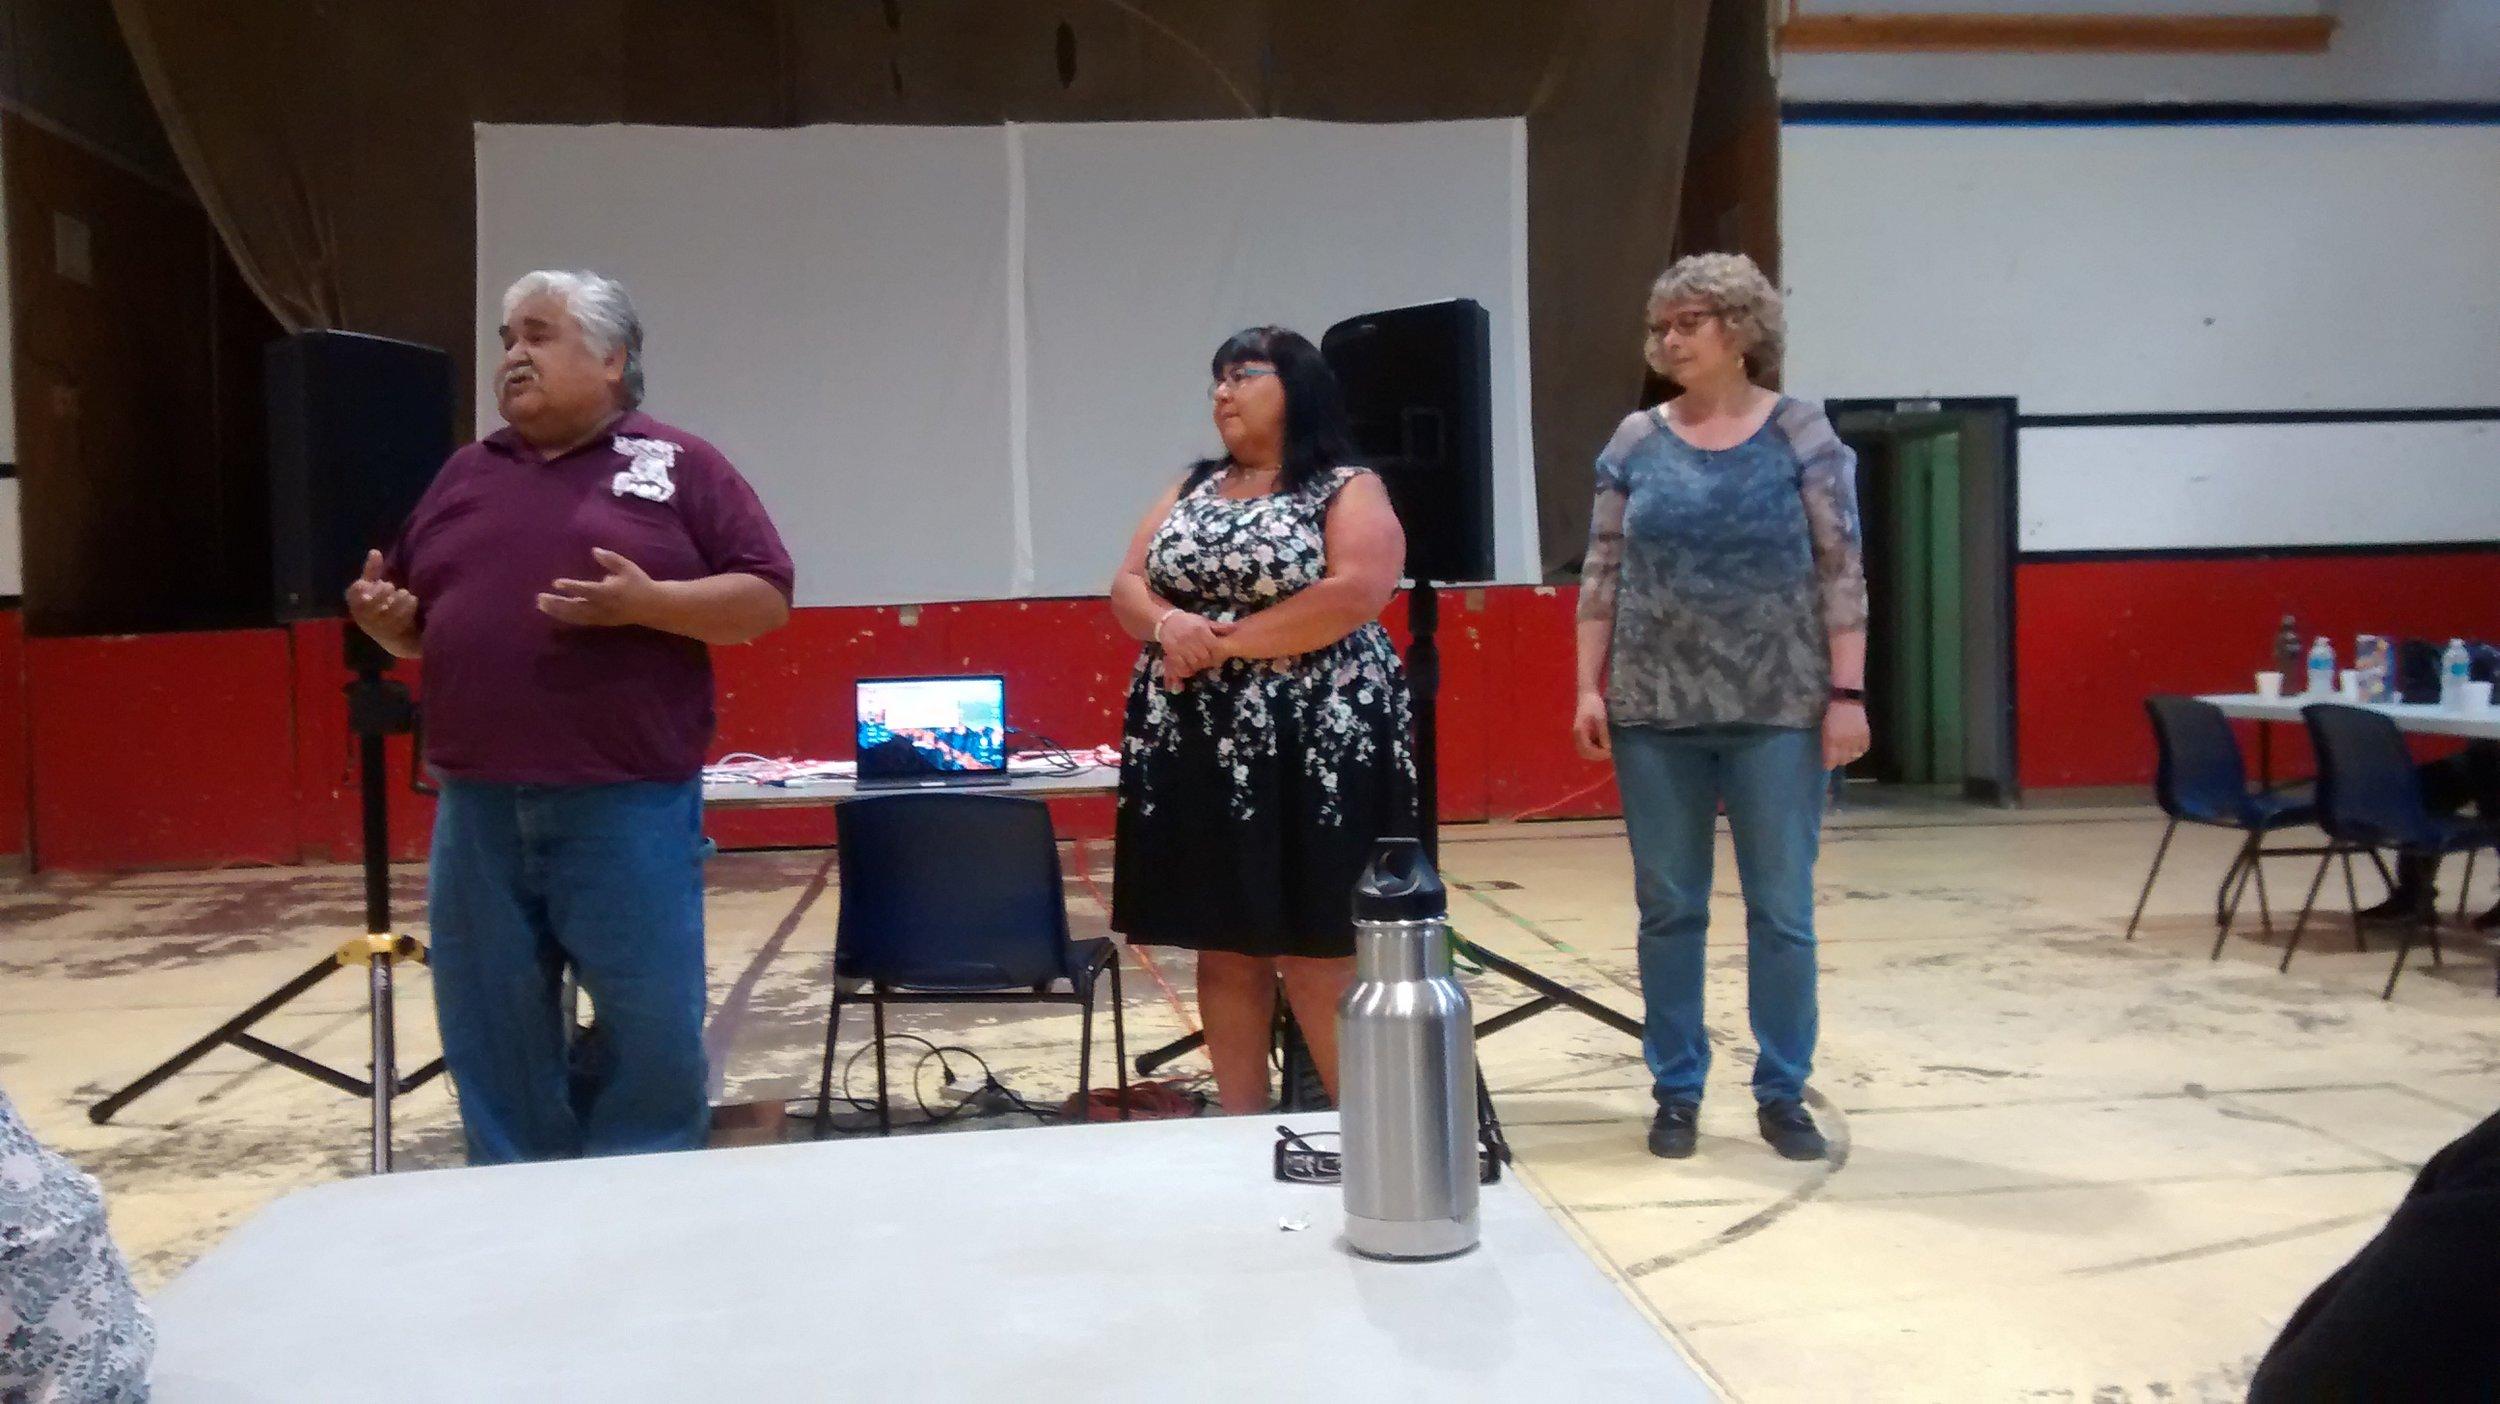 Paddy (Elder) , Leah (Teacher) and Sheila (Principal)